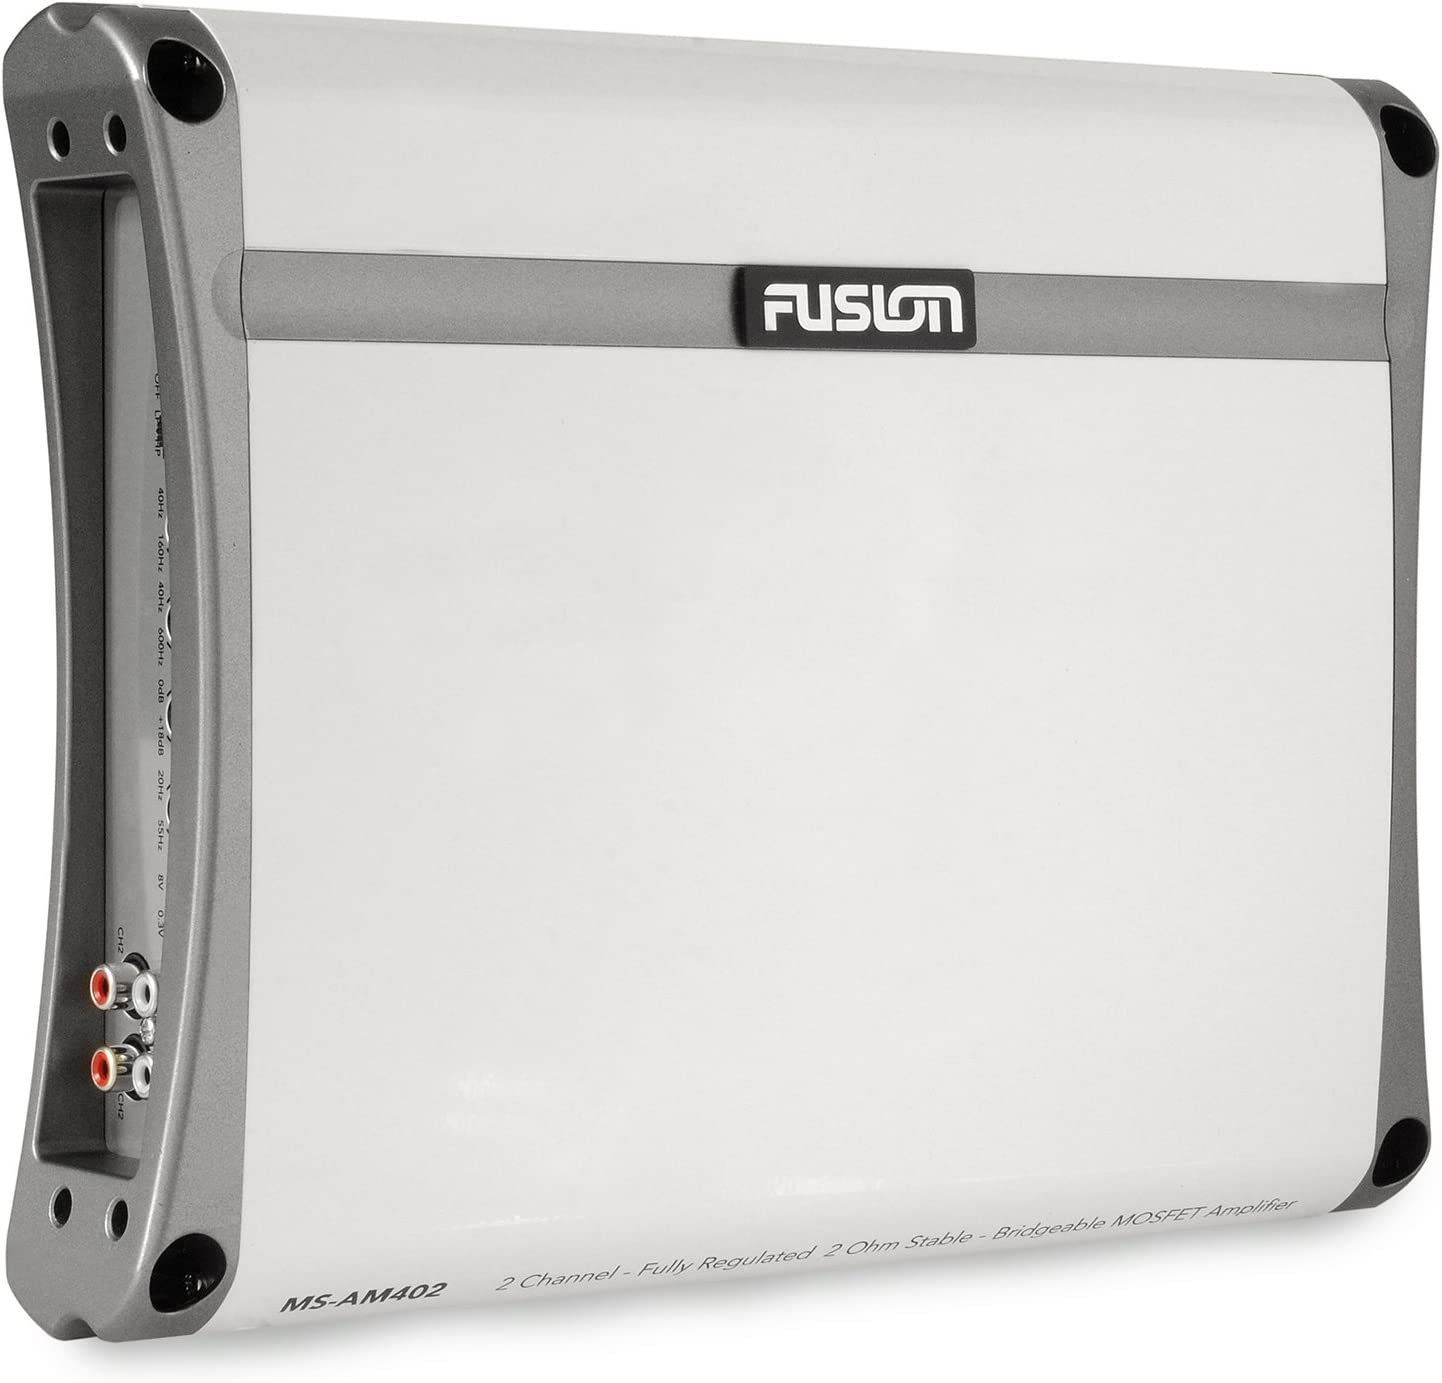 Garmin 010-01499-00 Fusion Entertainment 2-channel Marine Amplifier